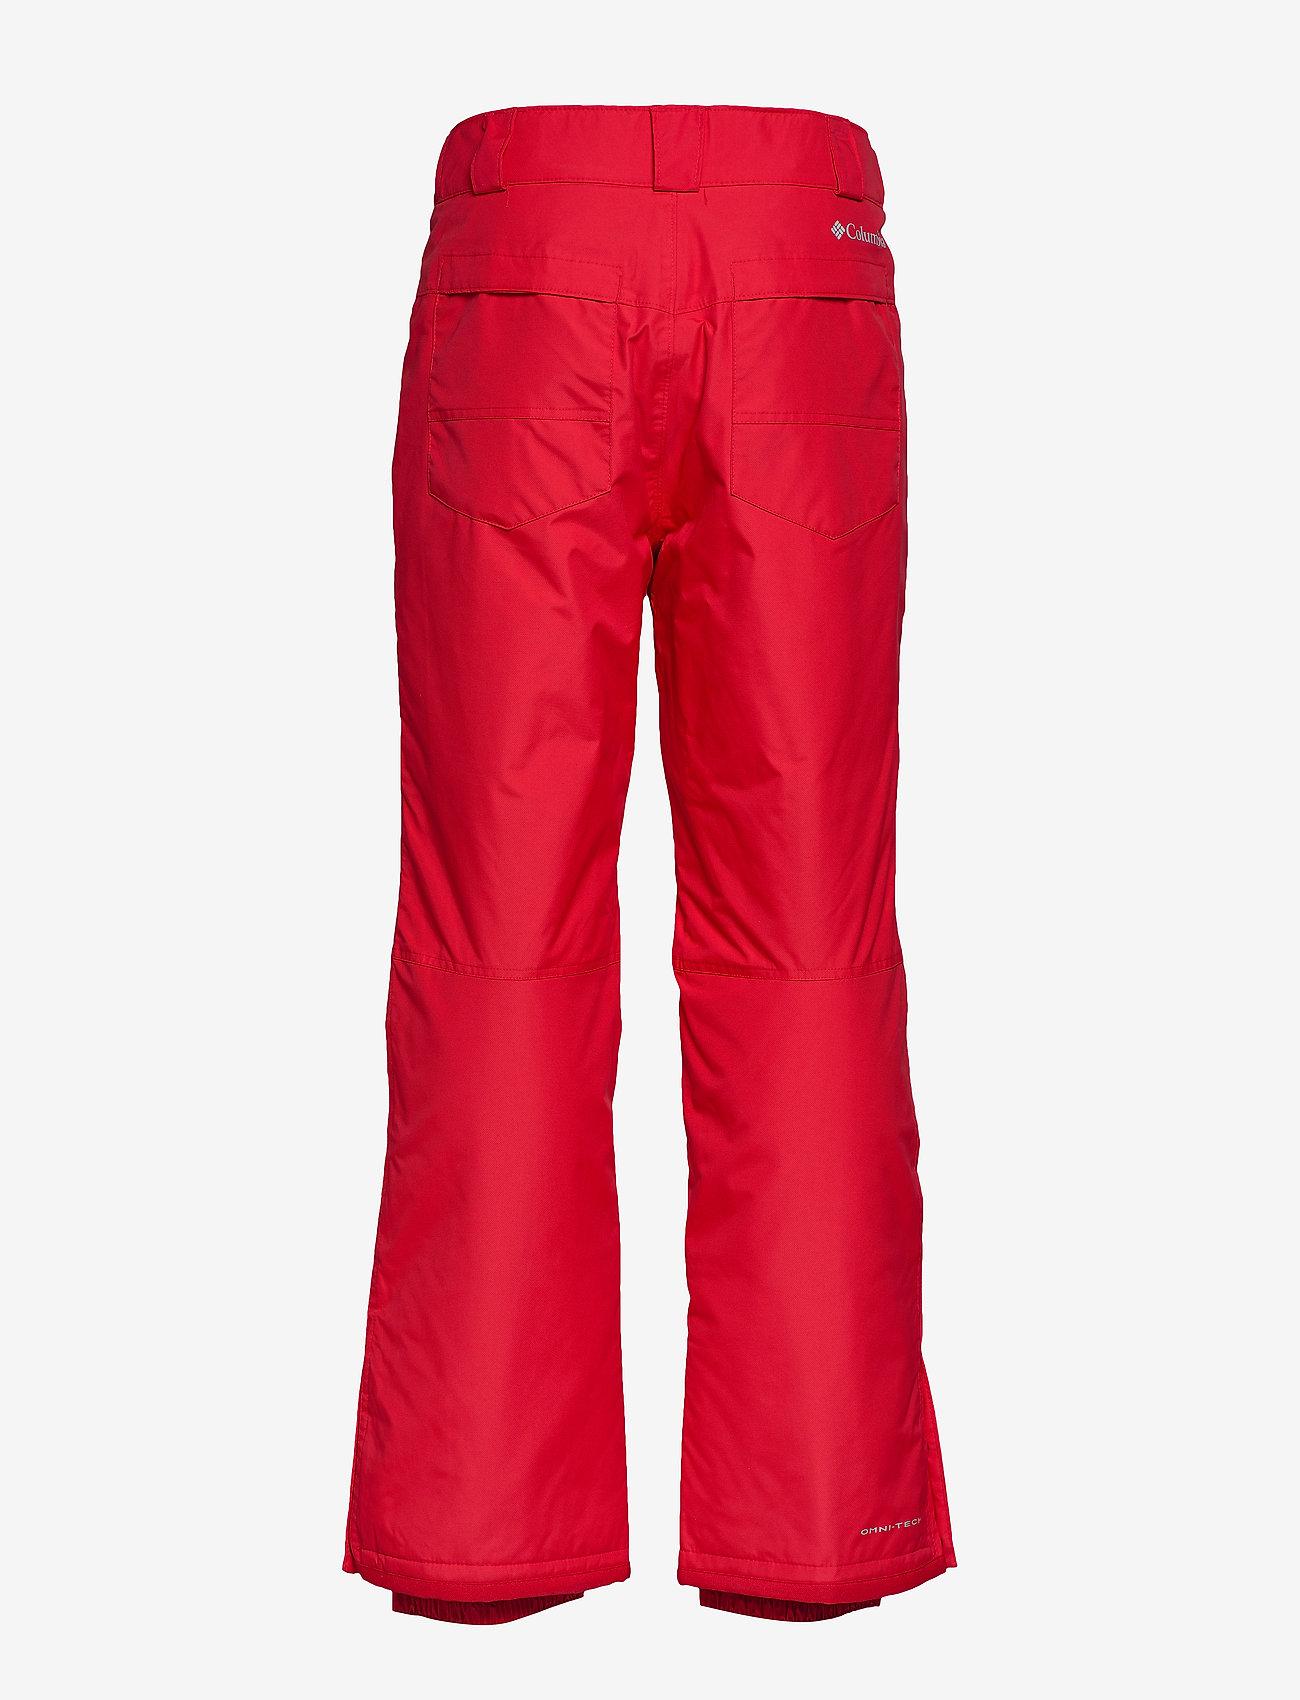 Columbia - Bugaboo IV Pant - spodnie narciarskie - mountain red - 1